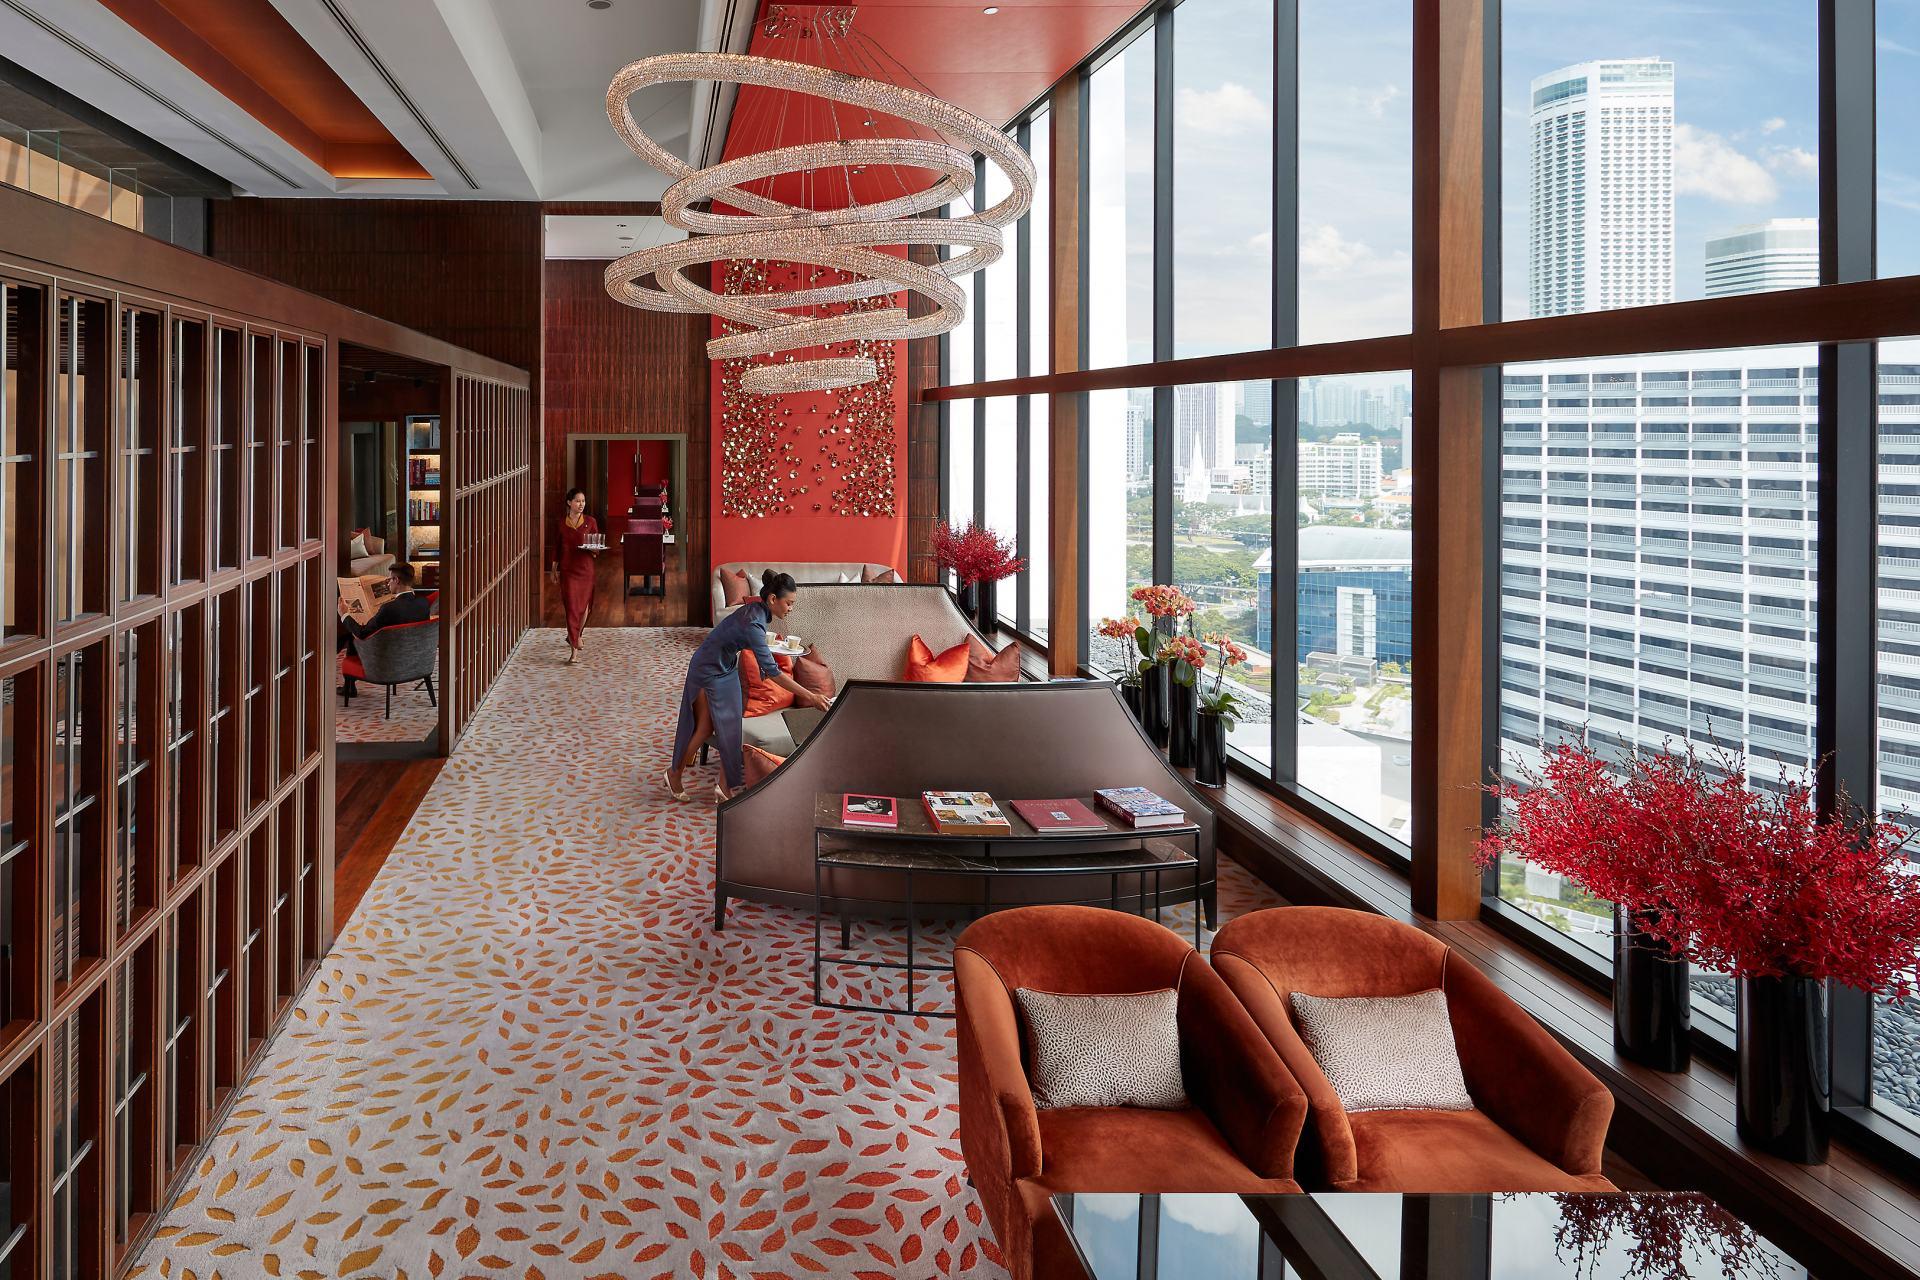 singapore-2017-hotel-club-lounge-02.jpg